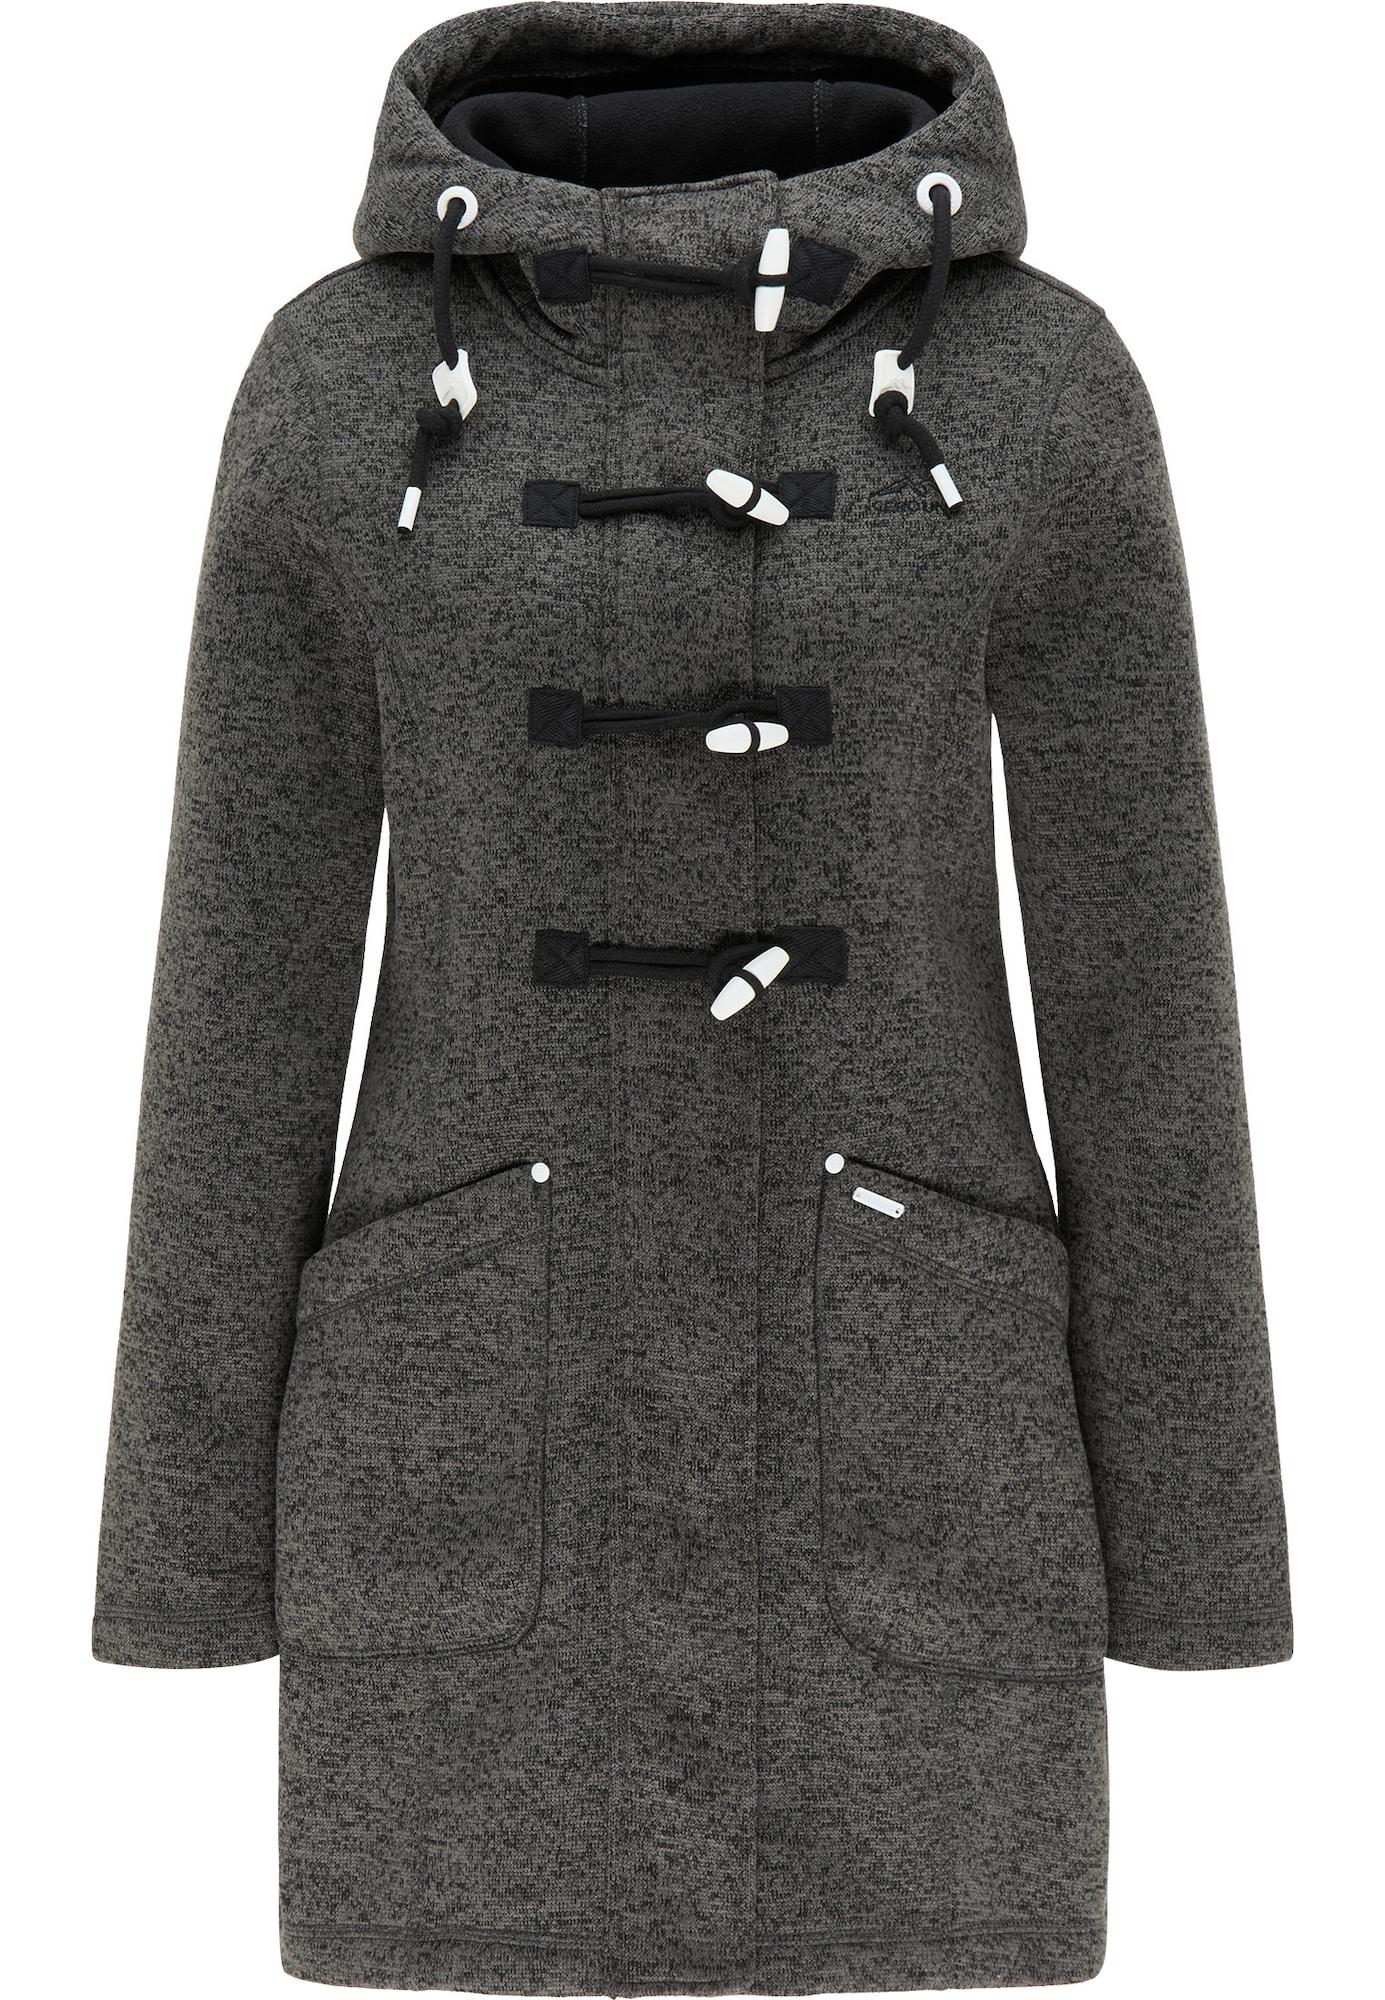 ICEBOUND Demisezoninis paltas pilka